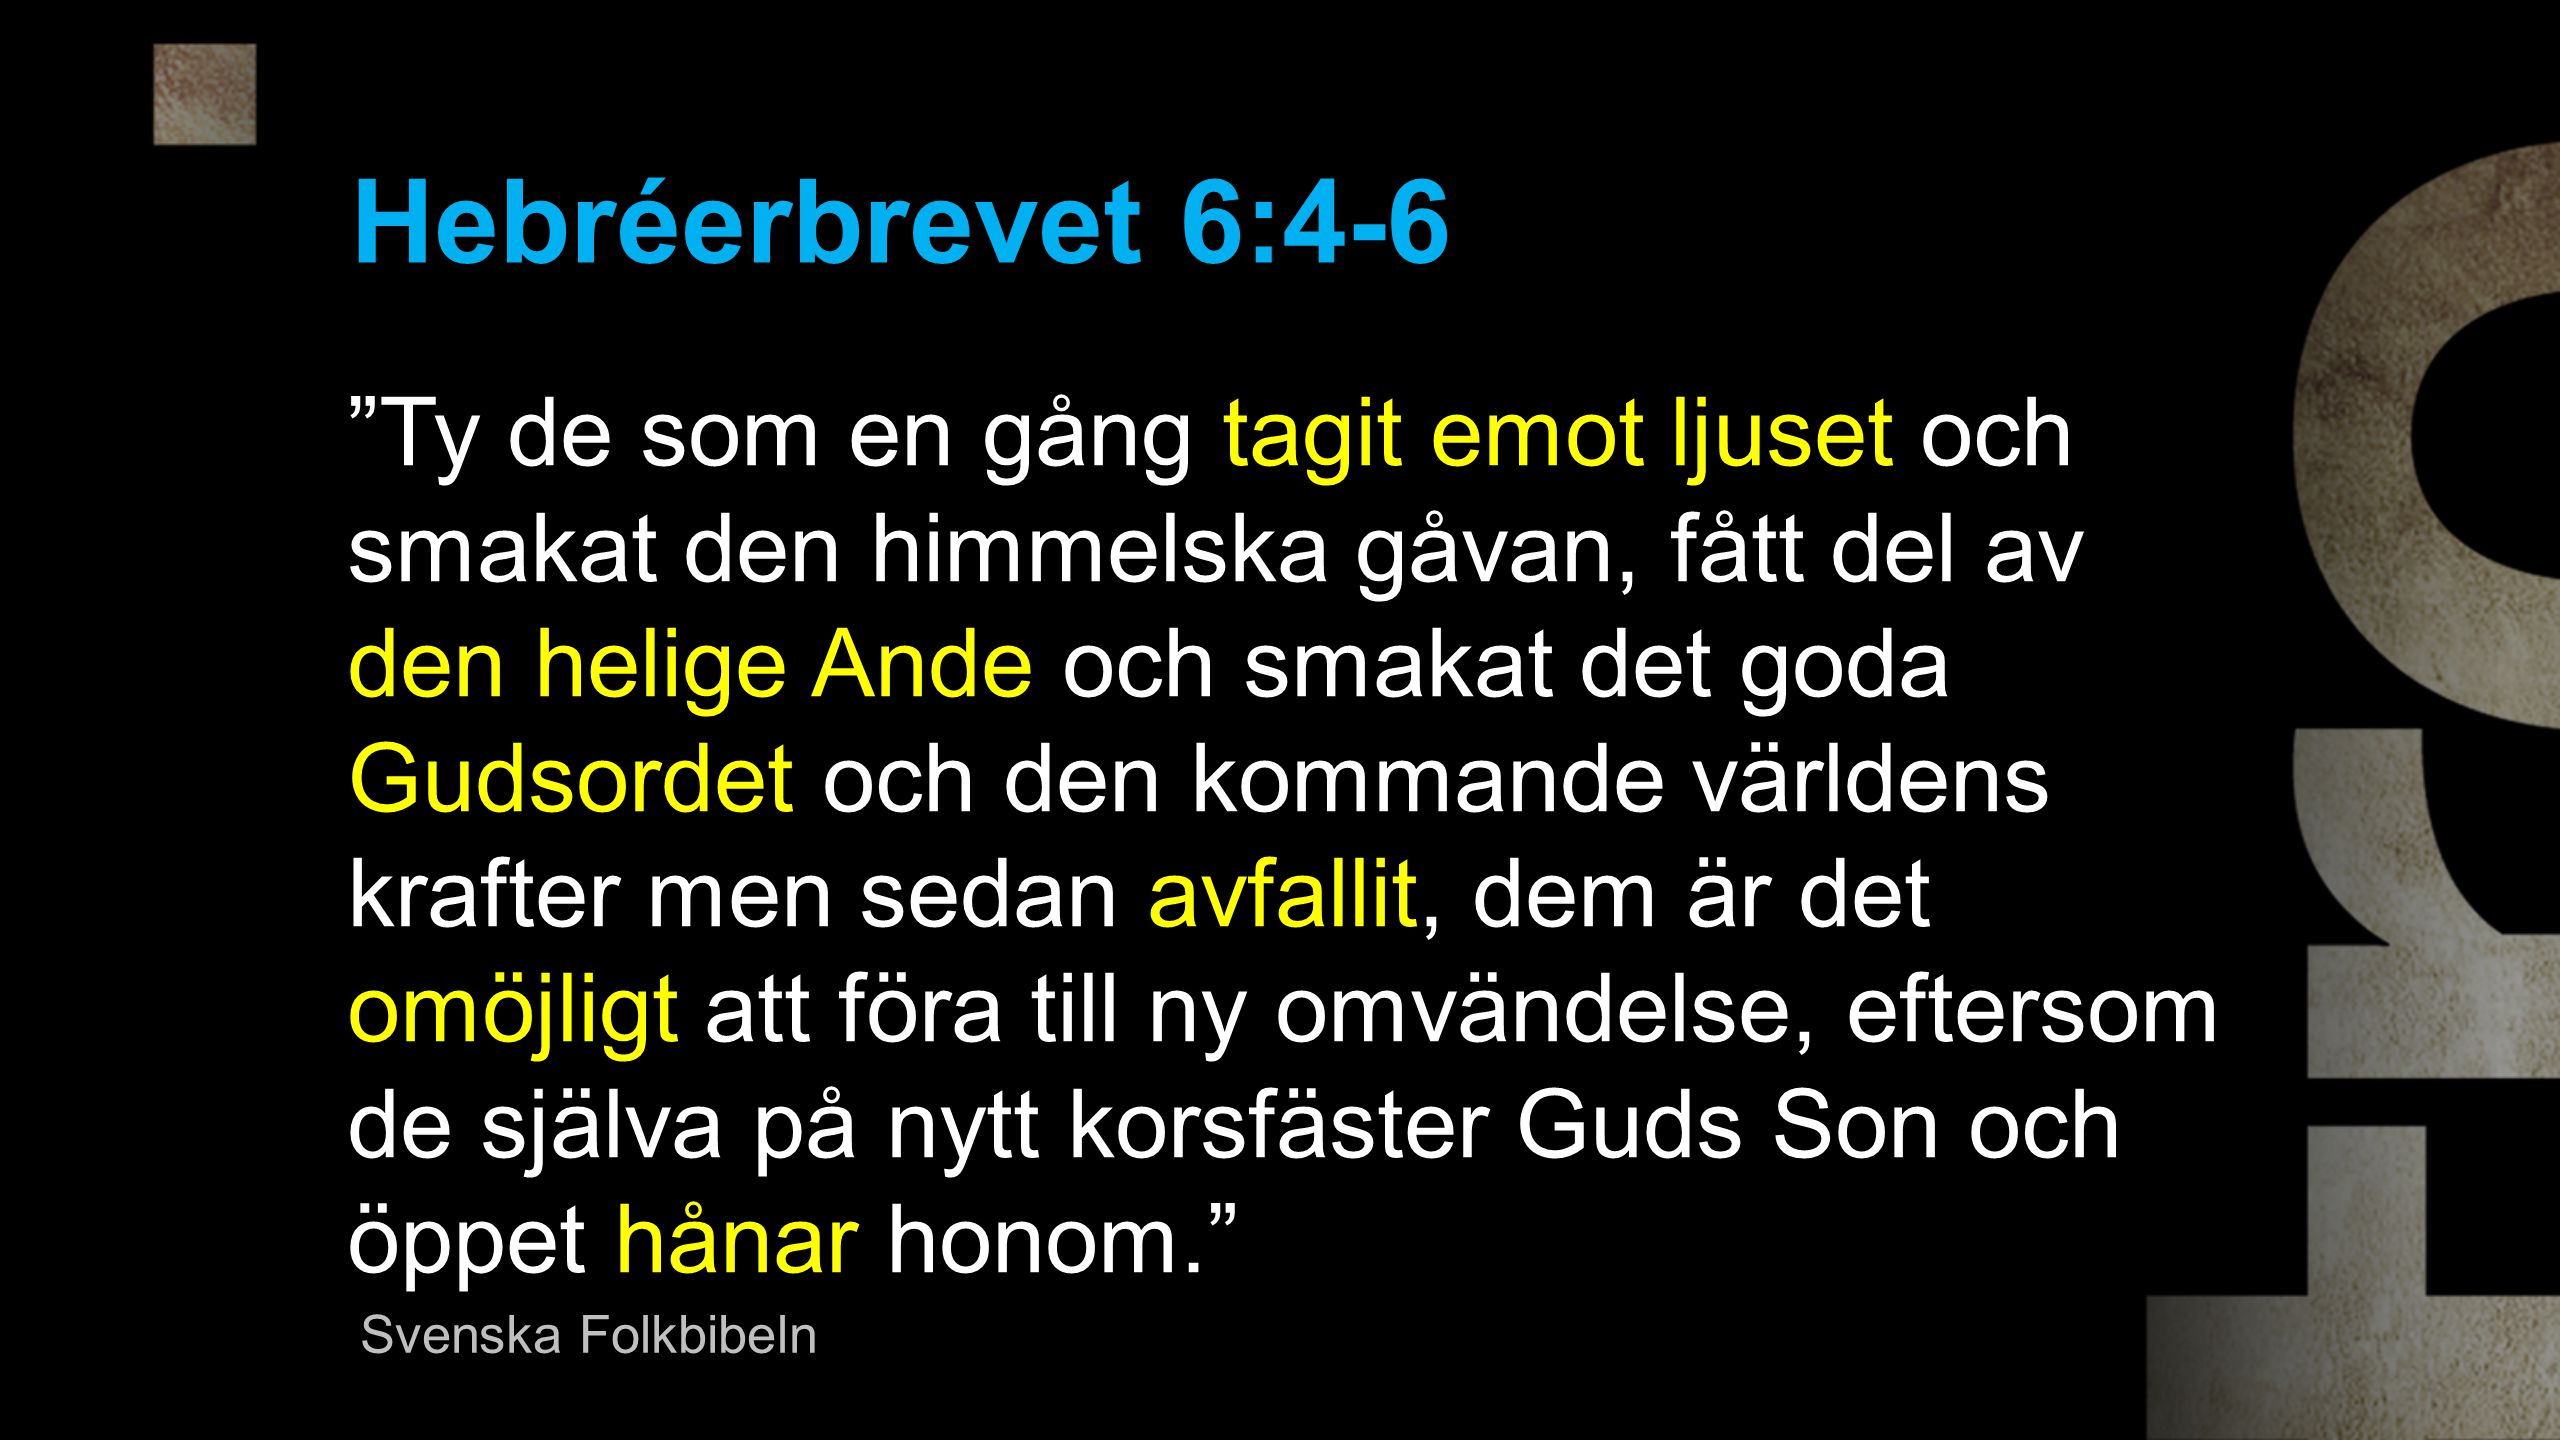 Hebréerbrevet 6:4-6